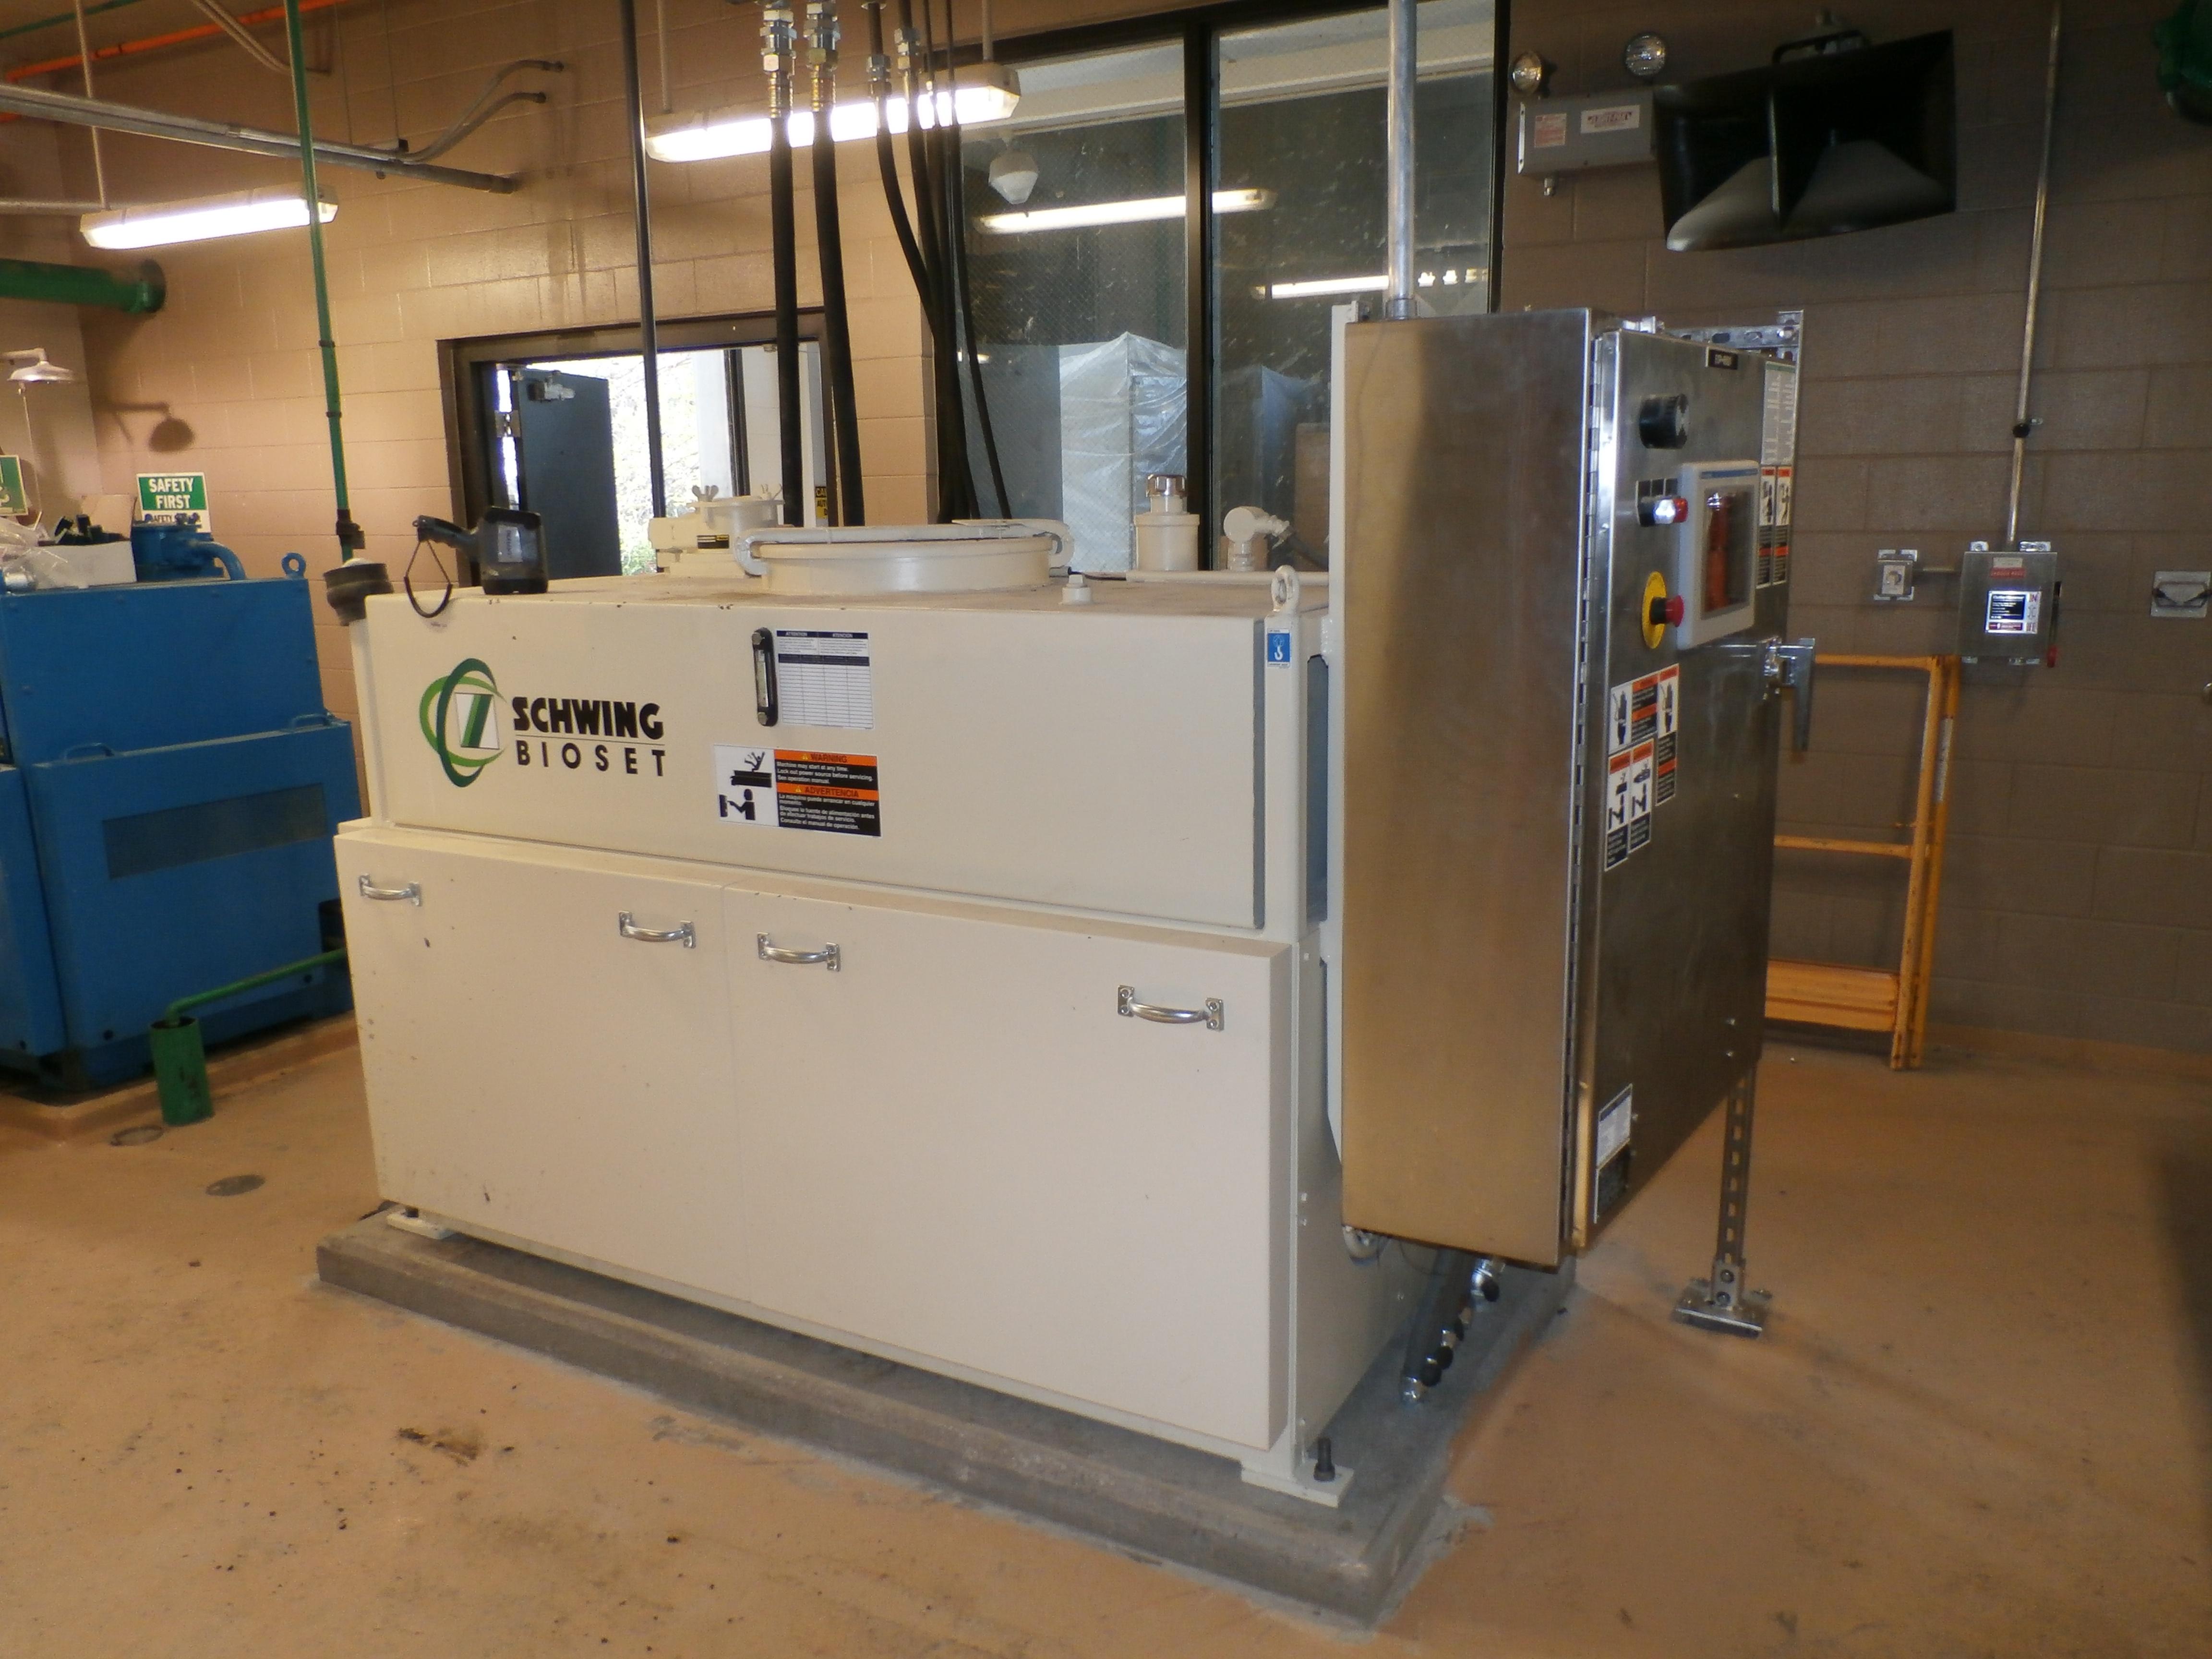 Schwing Bioset Hydraulic Power Pack